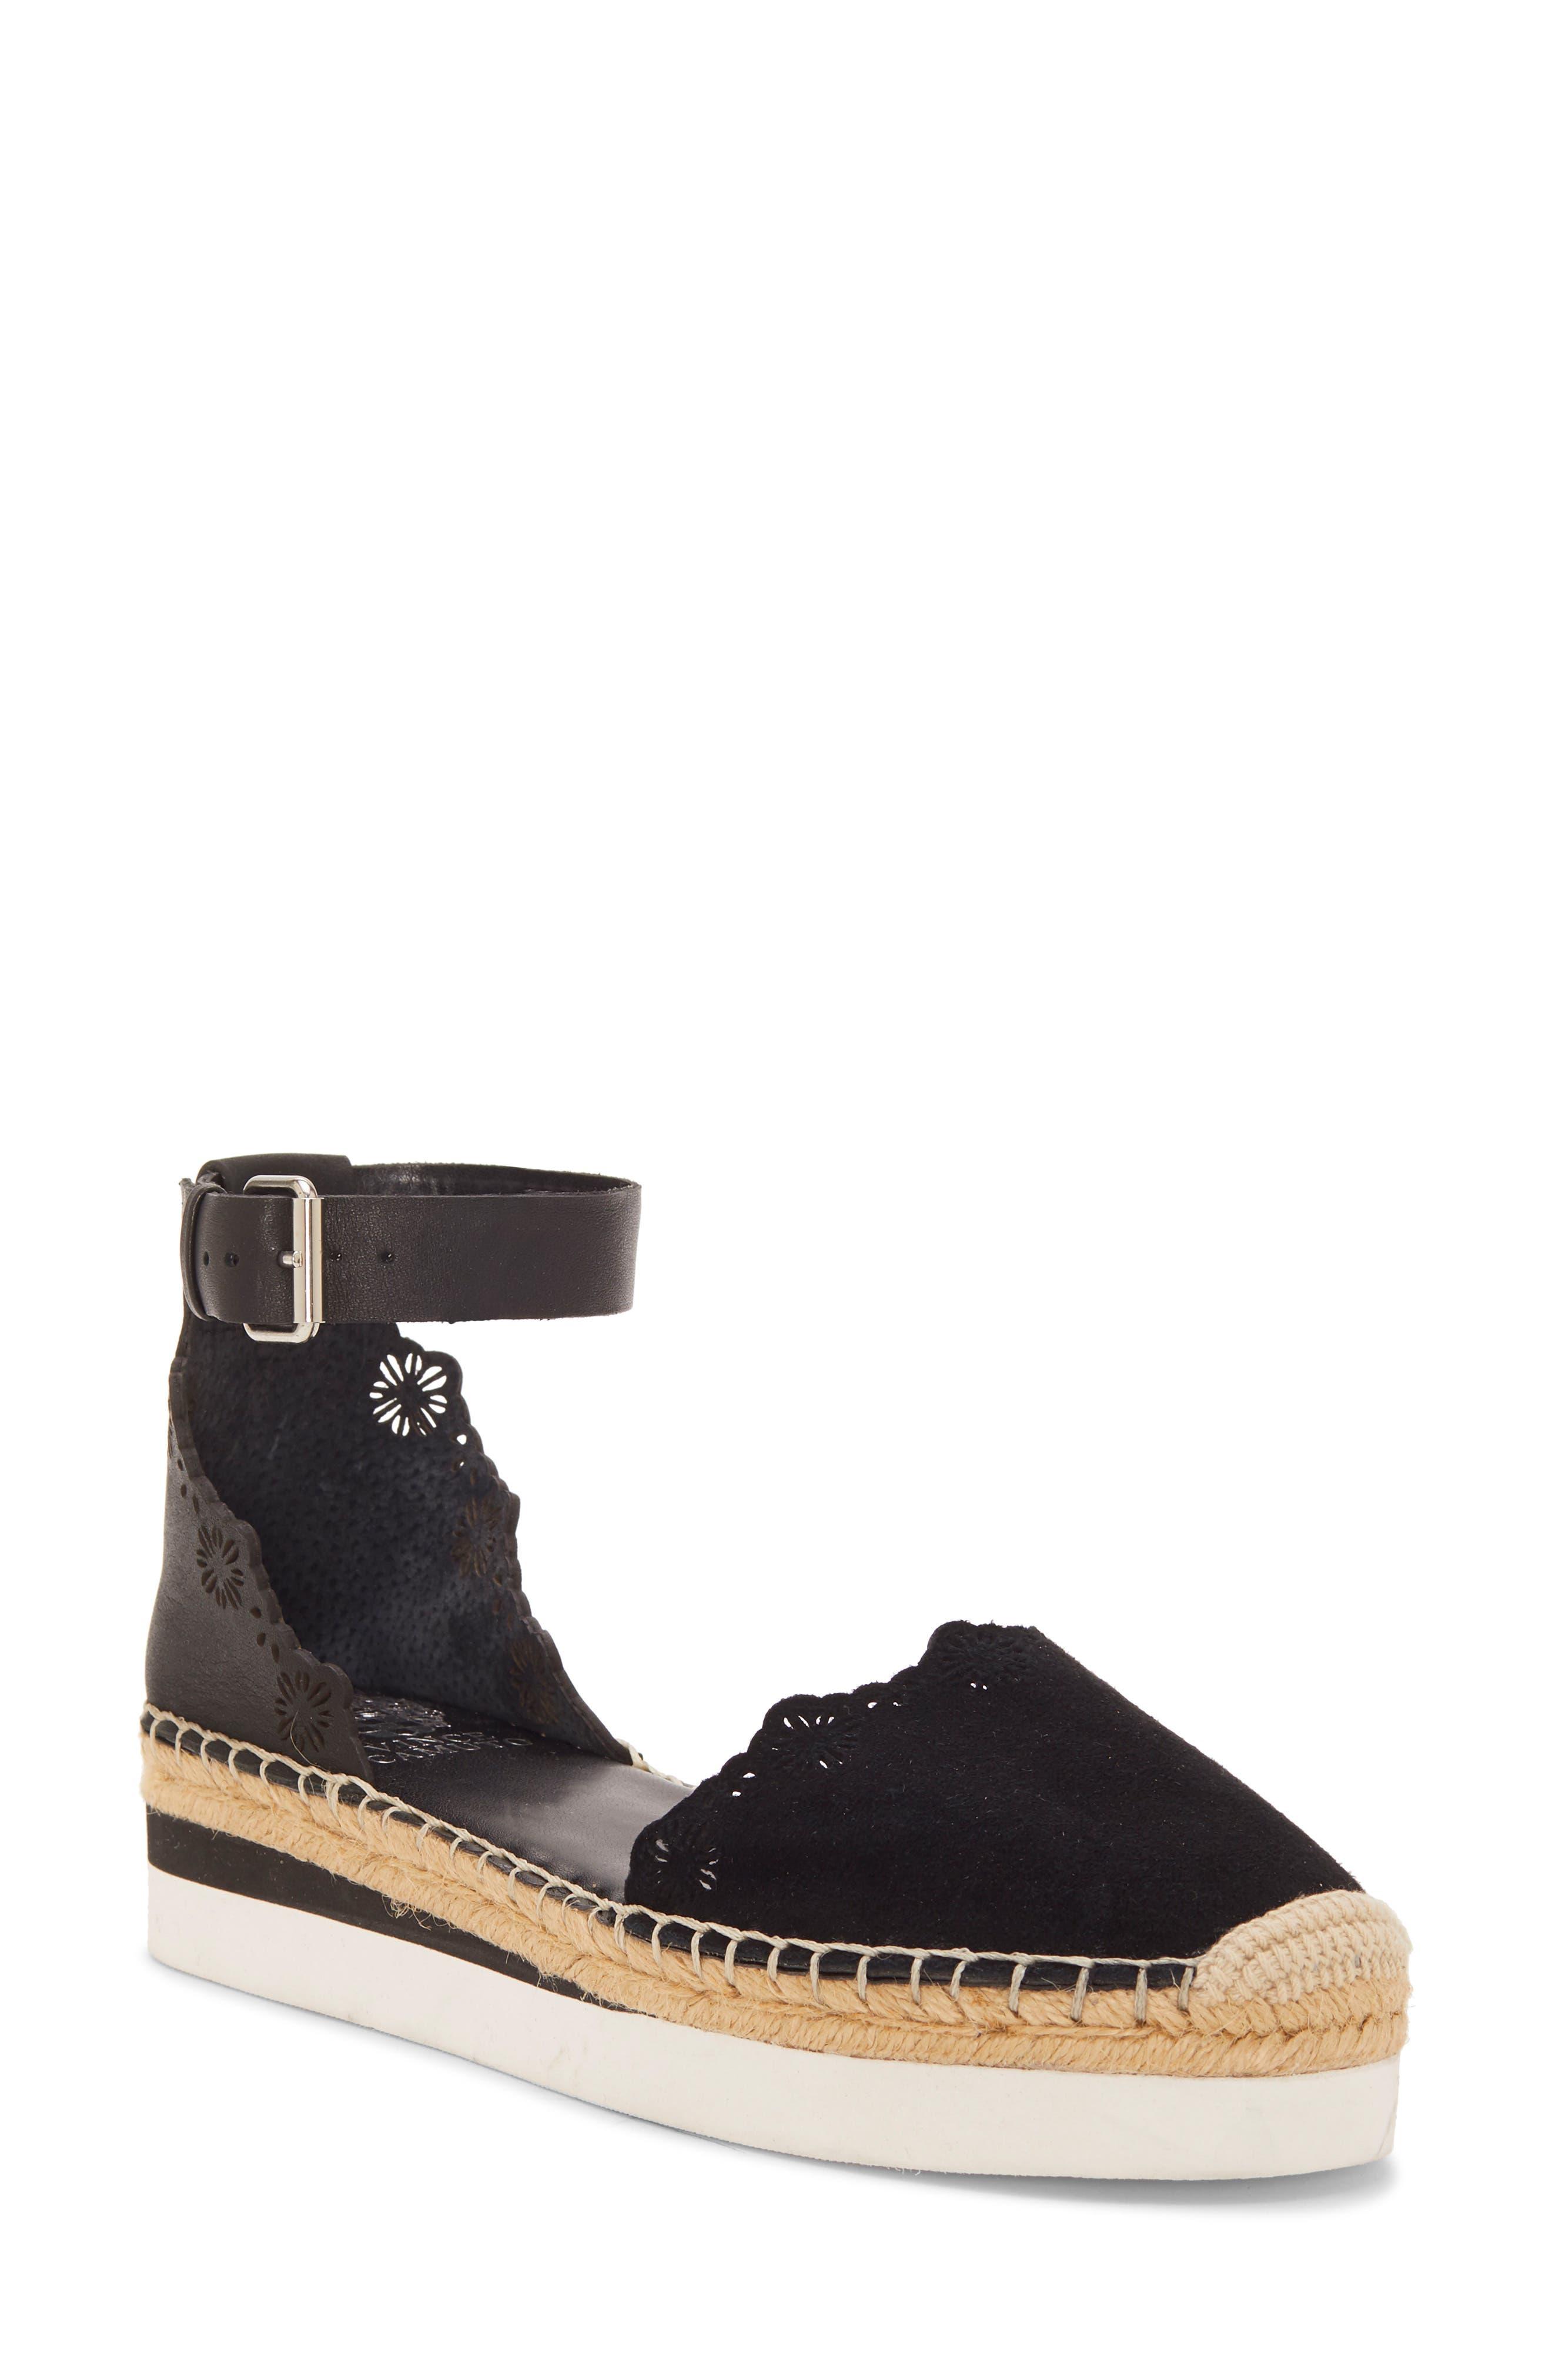 VINCE CAMUTO Breshan Ankle Strap Espadrille Wedge, Main, color, BLACK SUEDE